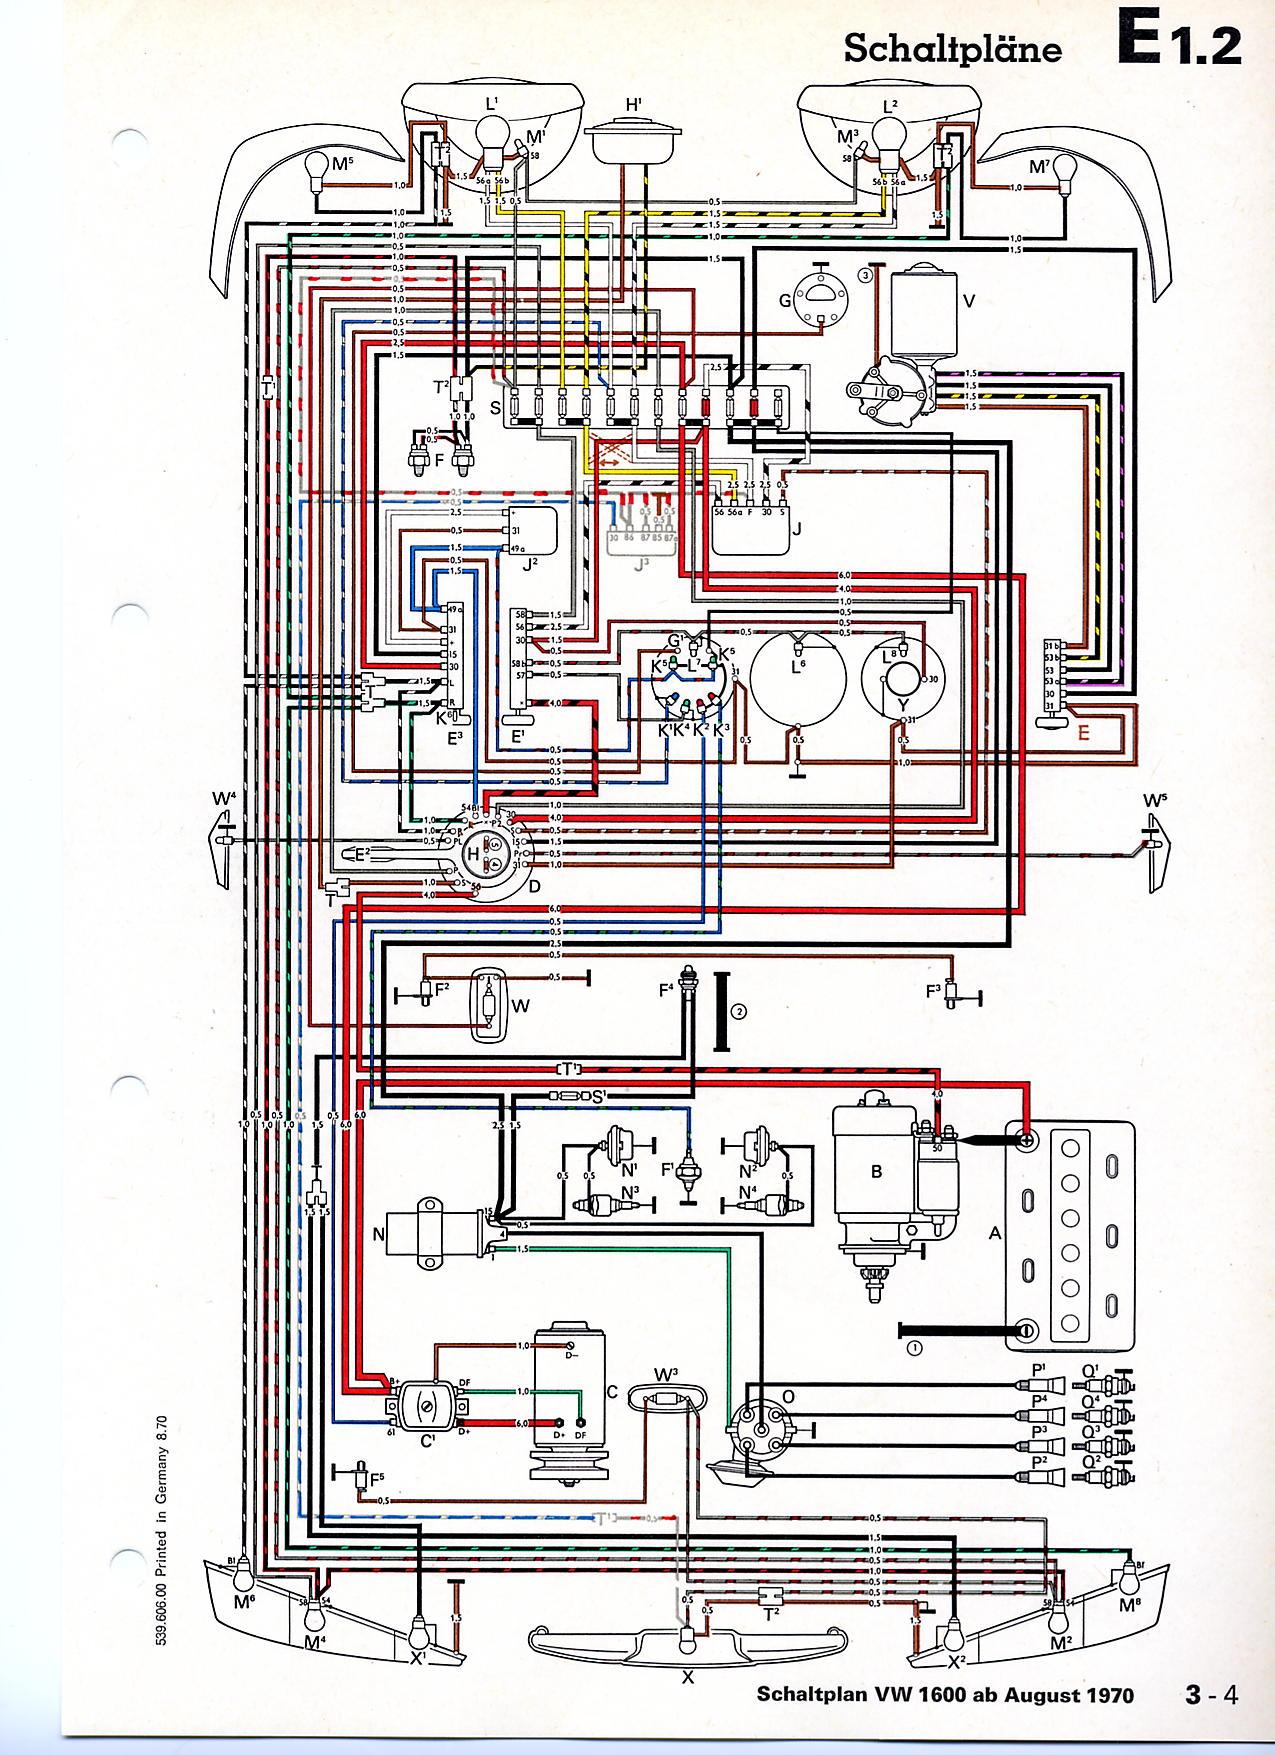 Schön 73 Vw Käfer Schaltplan Fotos - Schaltplan Serie Circuit ...